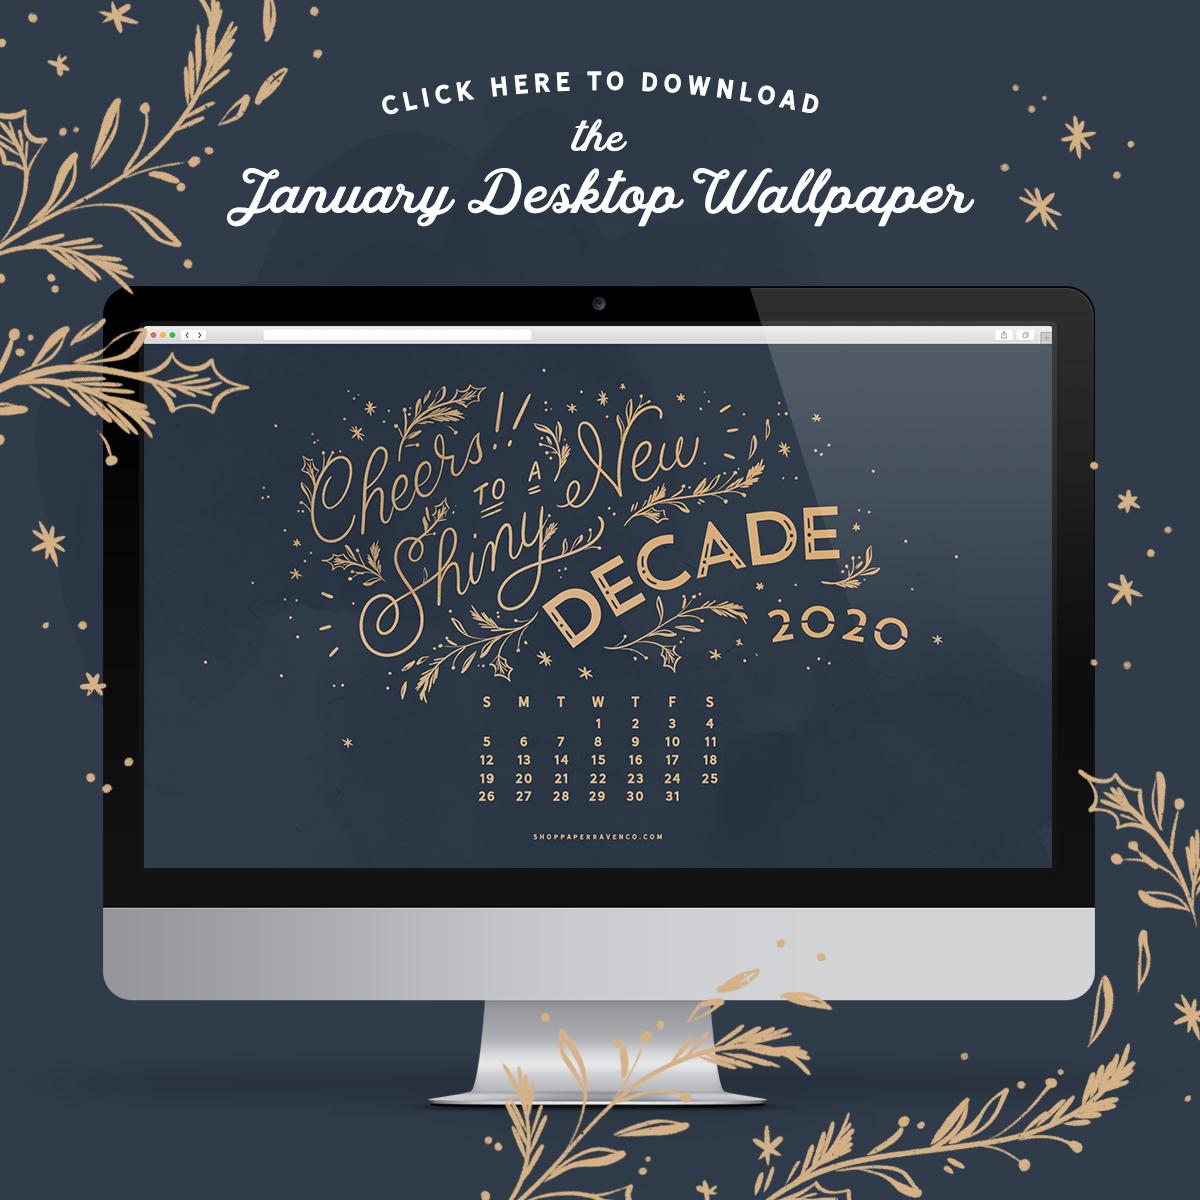 January 2020 Illustrated Desktop Wallpaper by Paper Raven Co. | www.ShopPaperRavenCo.com | #dressyourtech #desktopwallpaper #desktopdownload